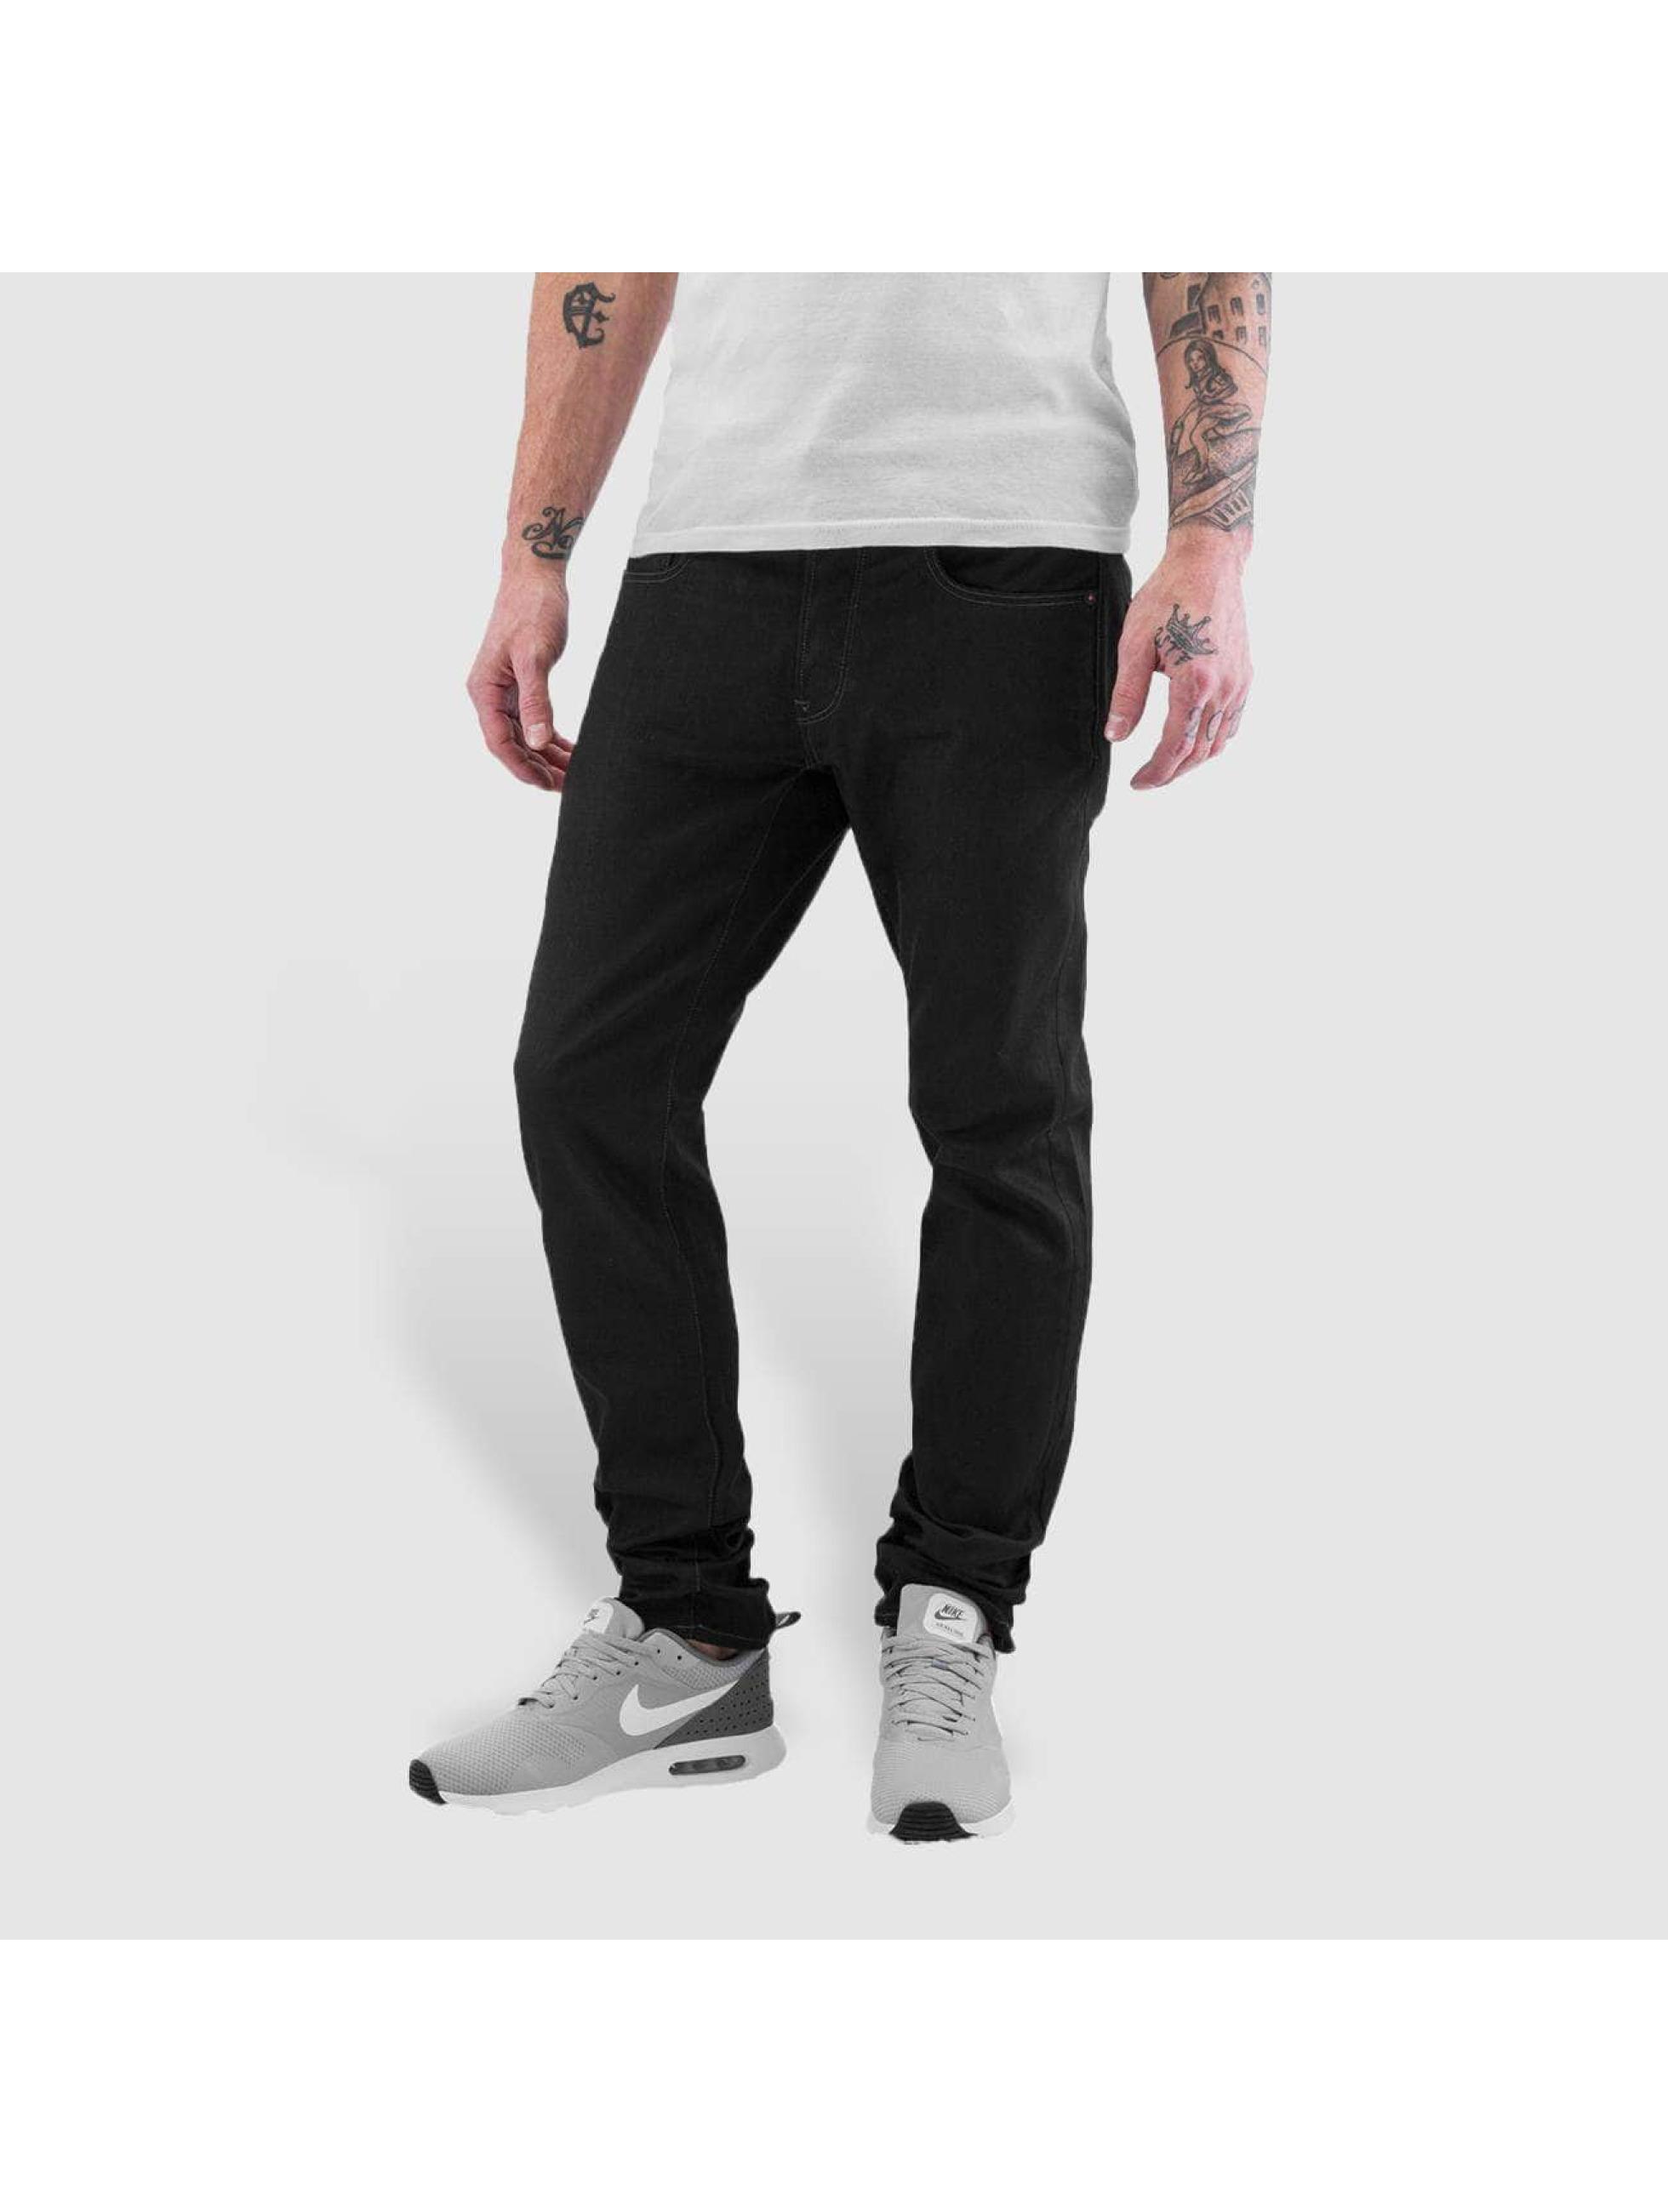 G-Star Skinny Jeans 3301 Slim schwarz